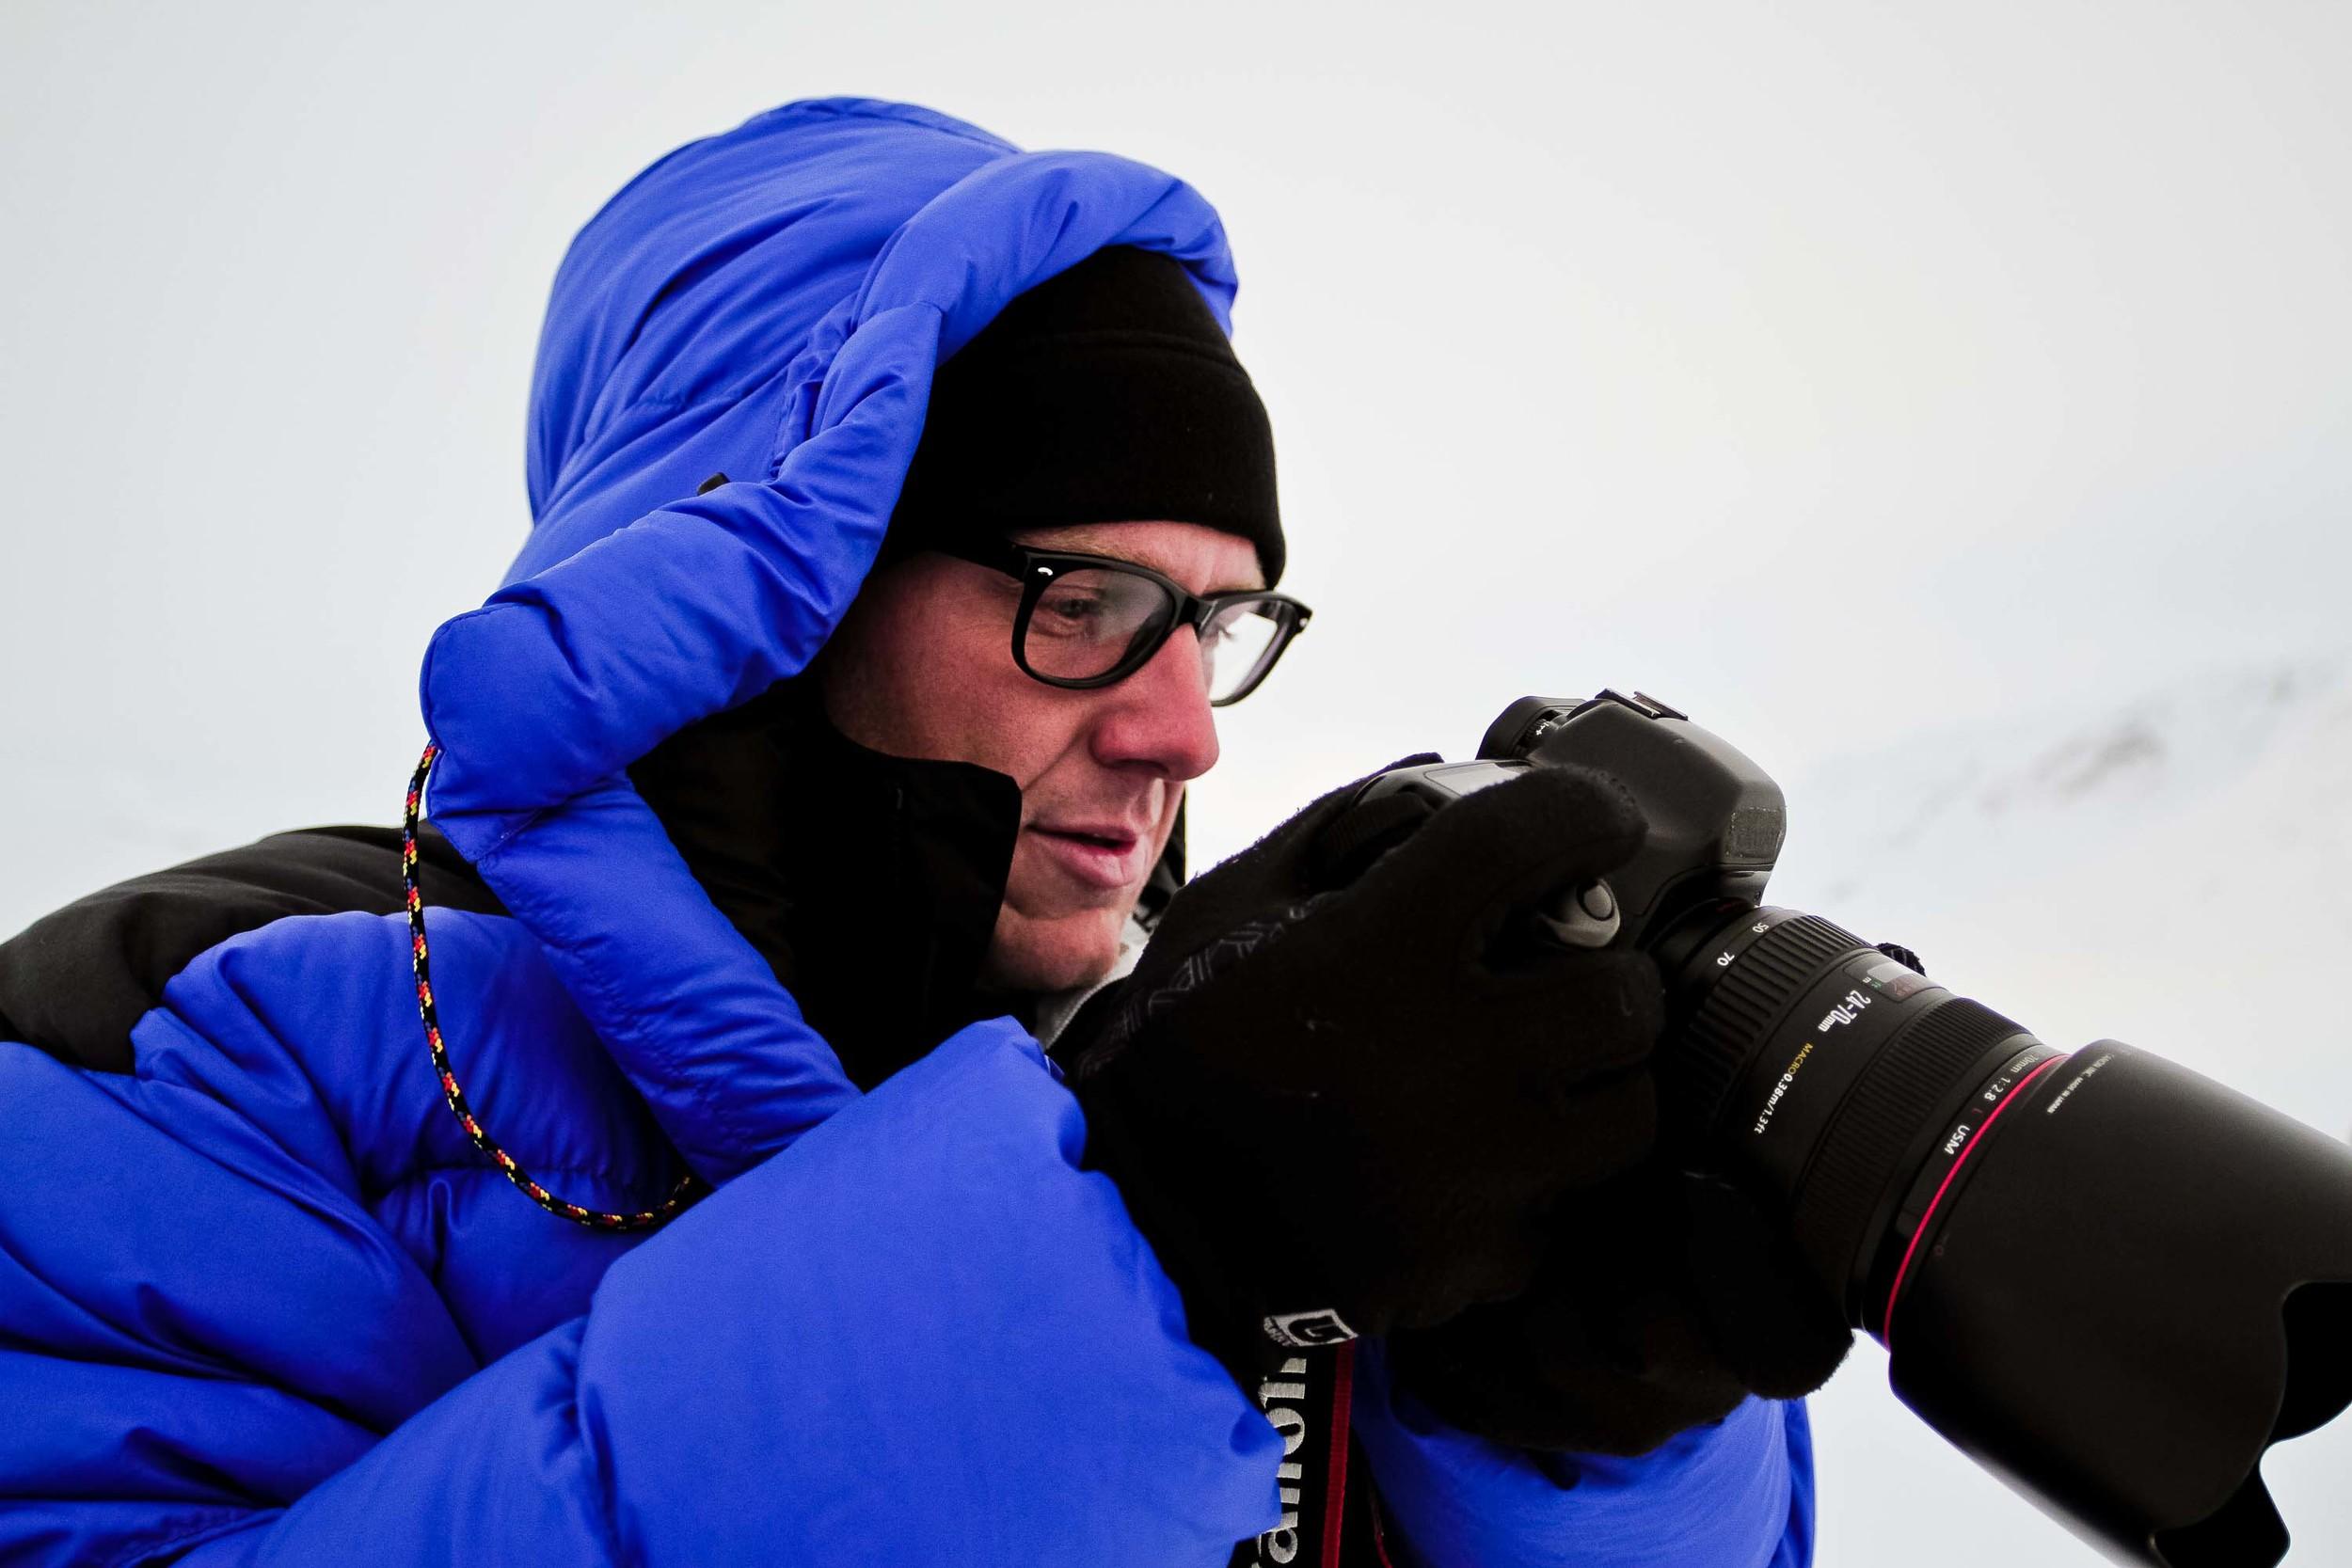 bryce-johnson-photography-actor-world-travel-explorer-photo-61.jpg